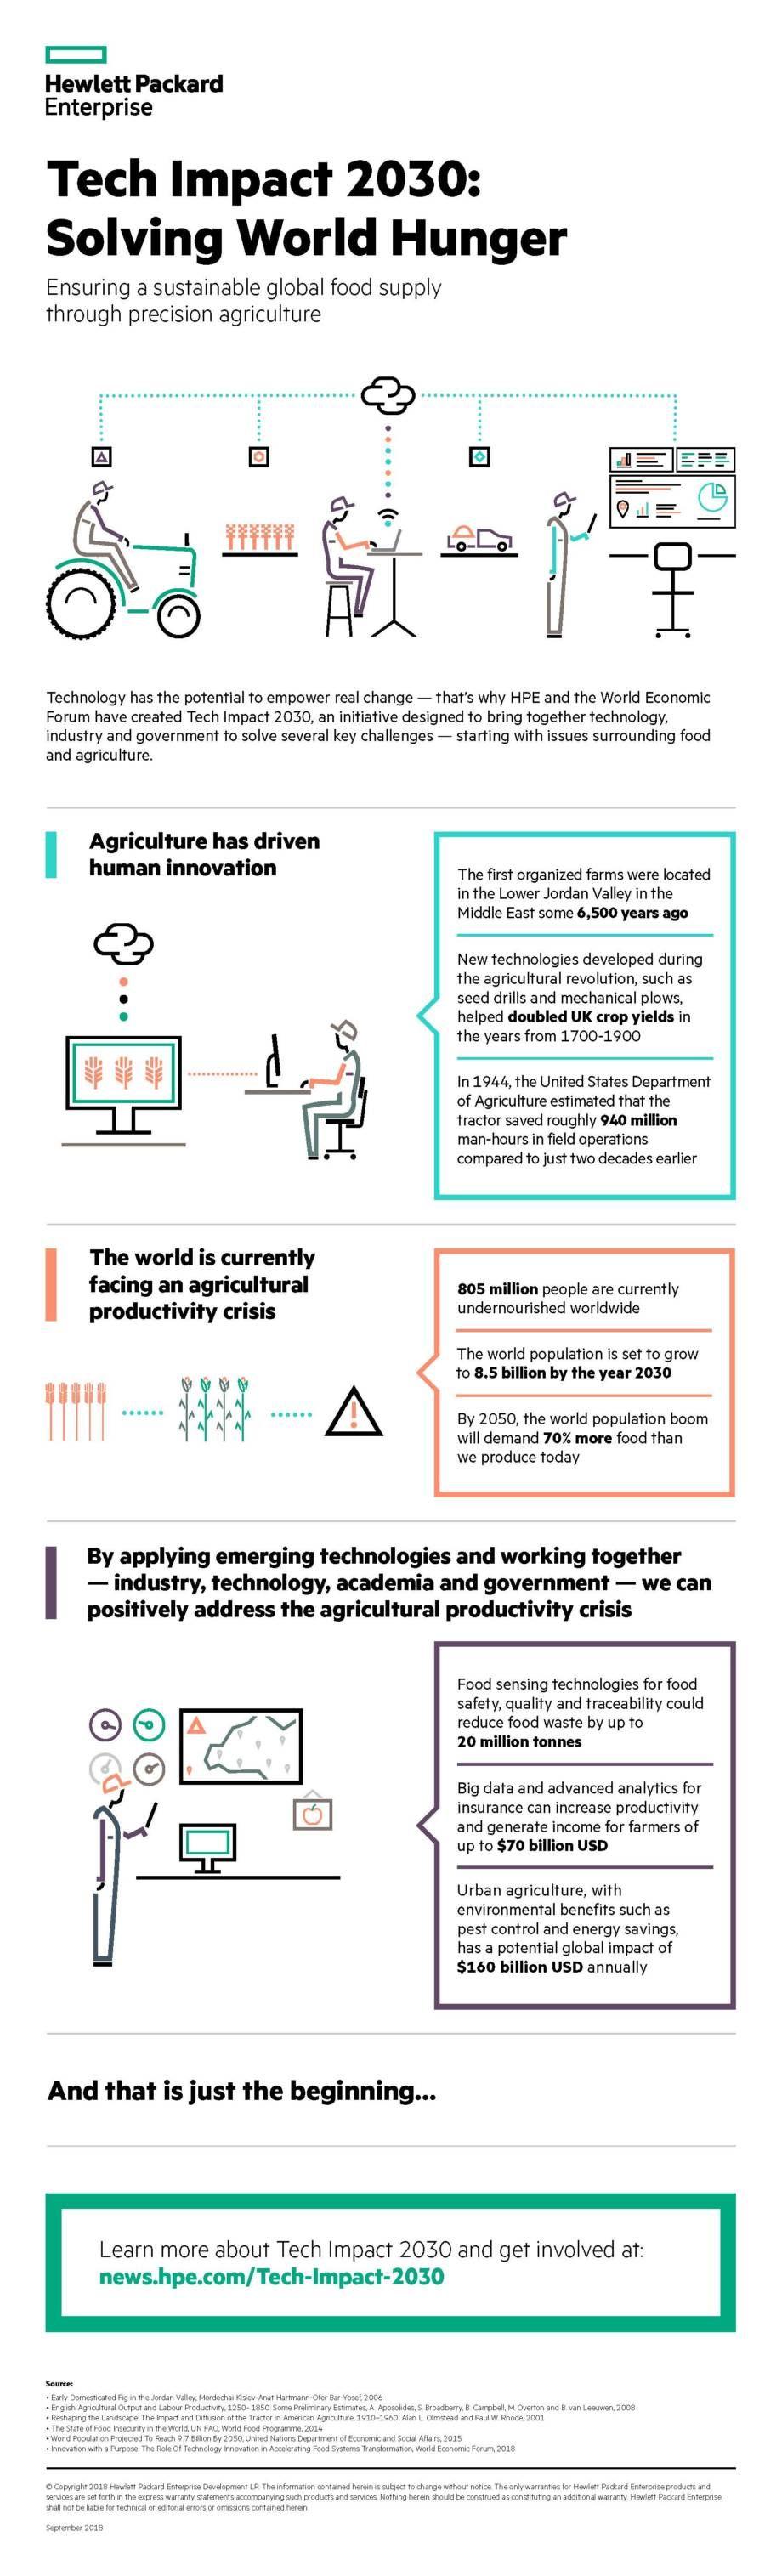 Infographic-Tech-Impact-2030-Solving-World-Hunger-920x3031.jpg